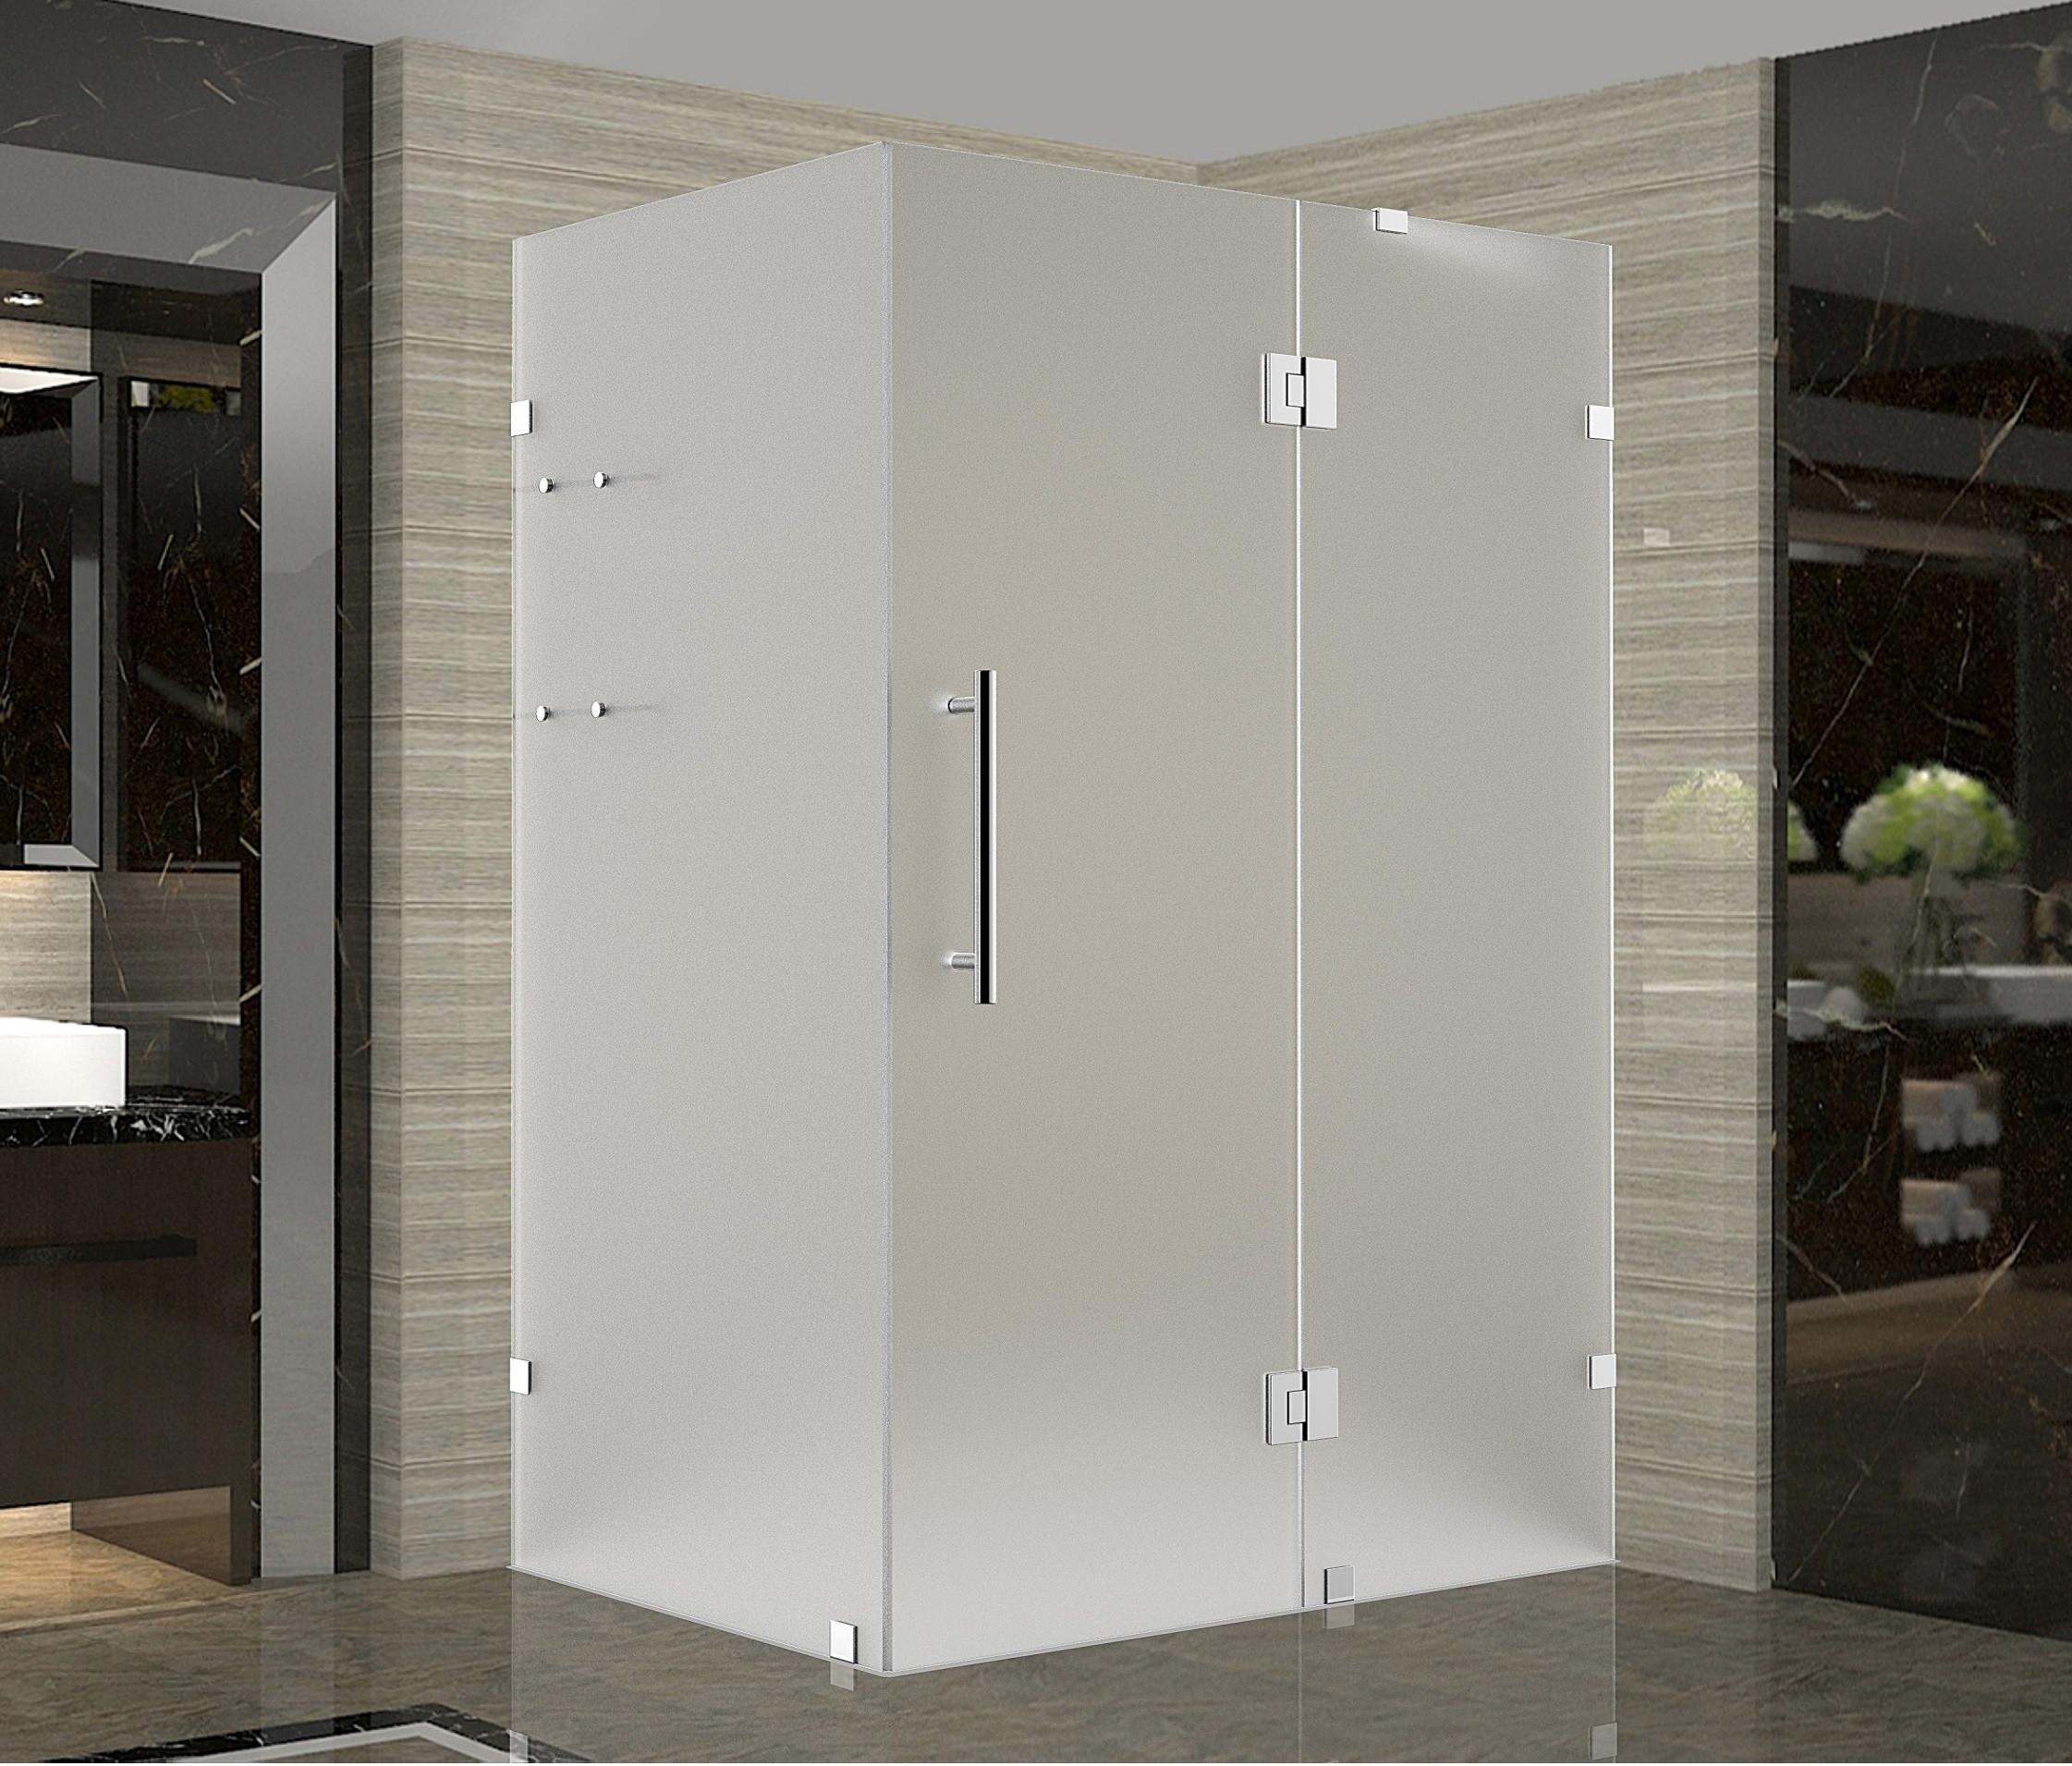 Aston Global SEN992F-SS-3936-10 Stainless Steel Completely Frameless Frosted Shower Enclosure